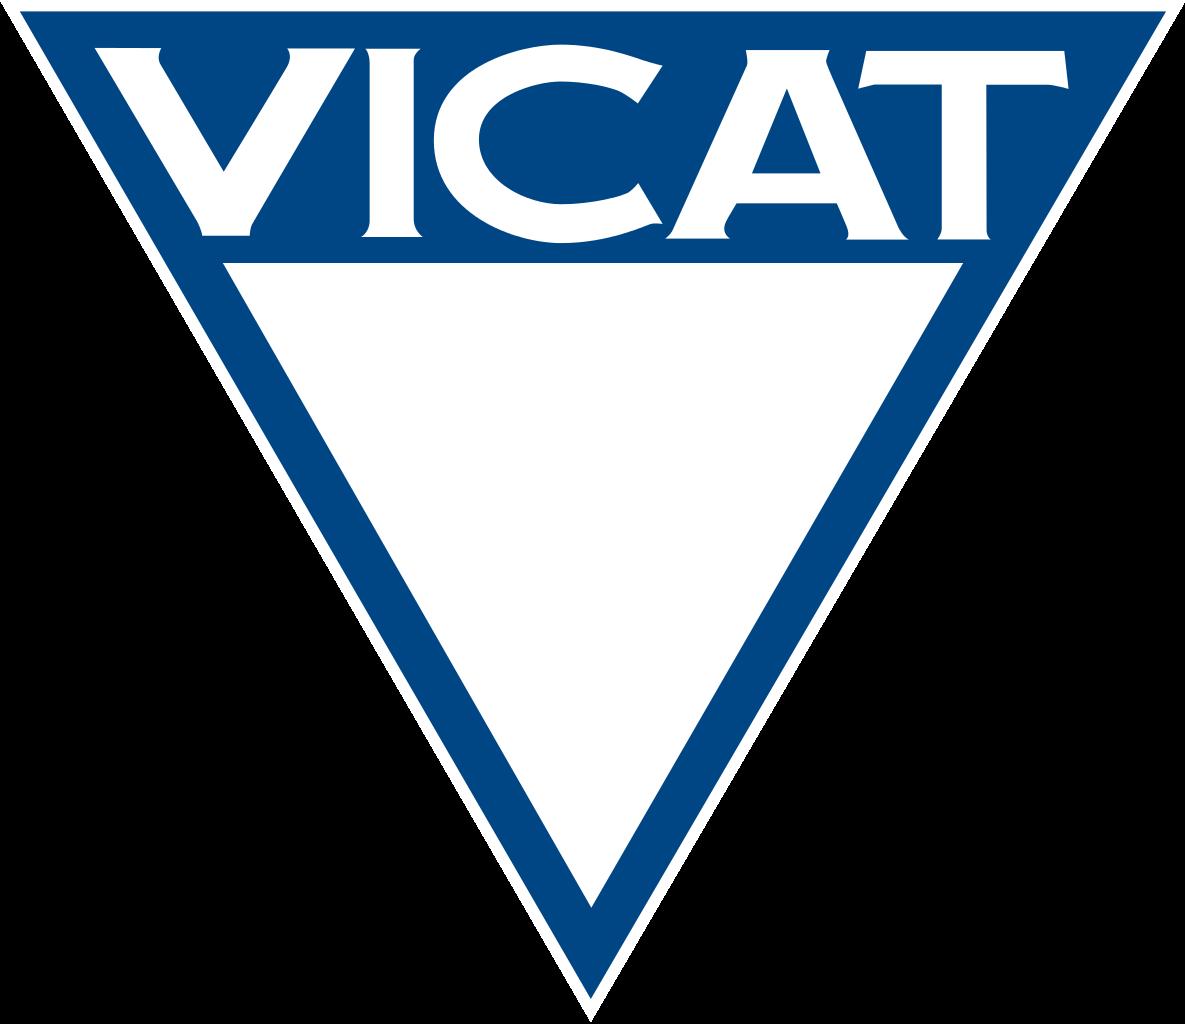 Vicat_SA_logo